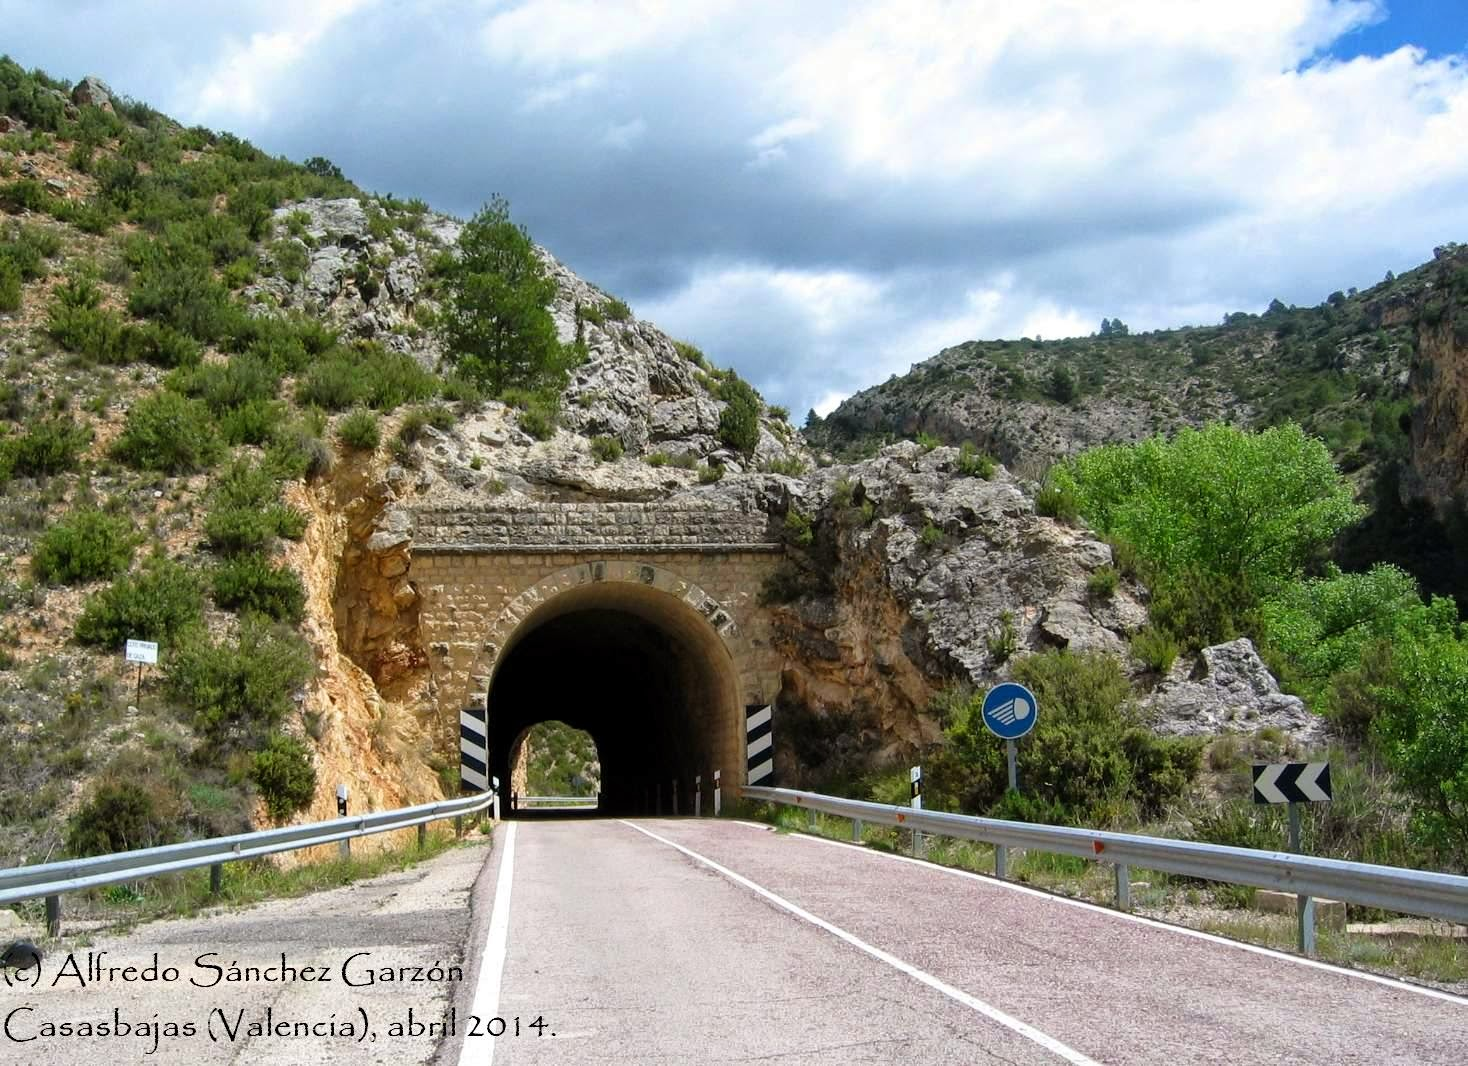 casasbajas-valencia-tunel-cn-330